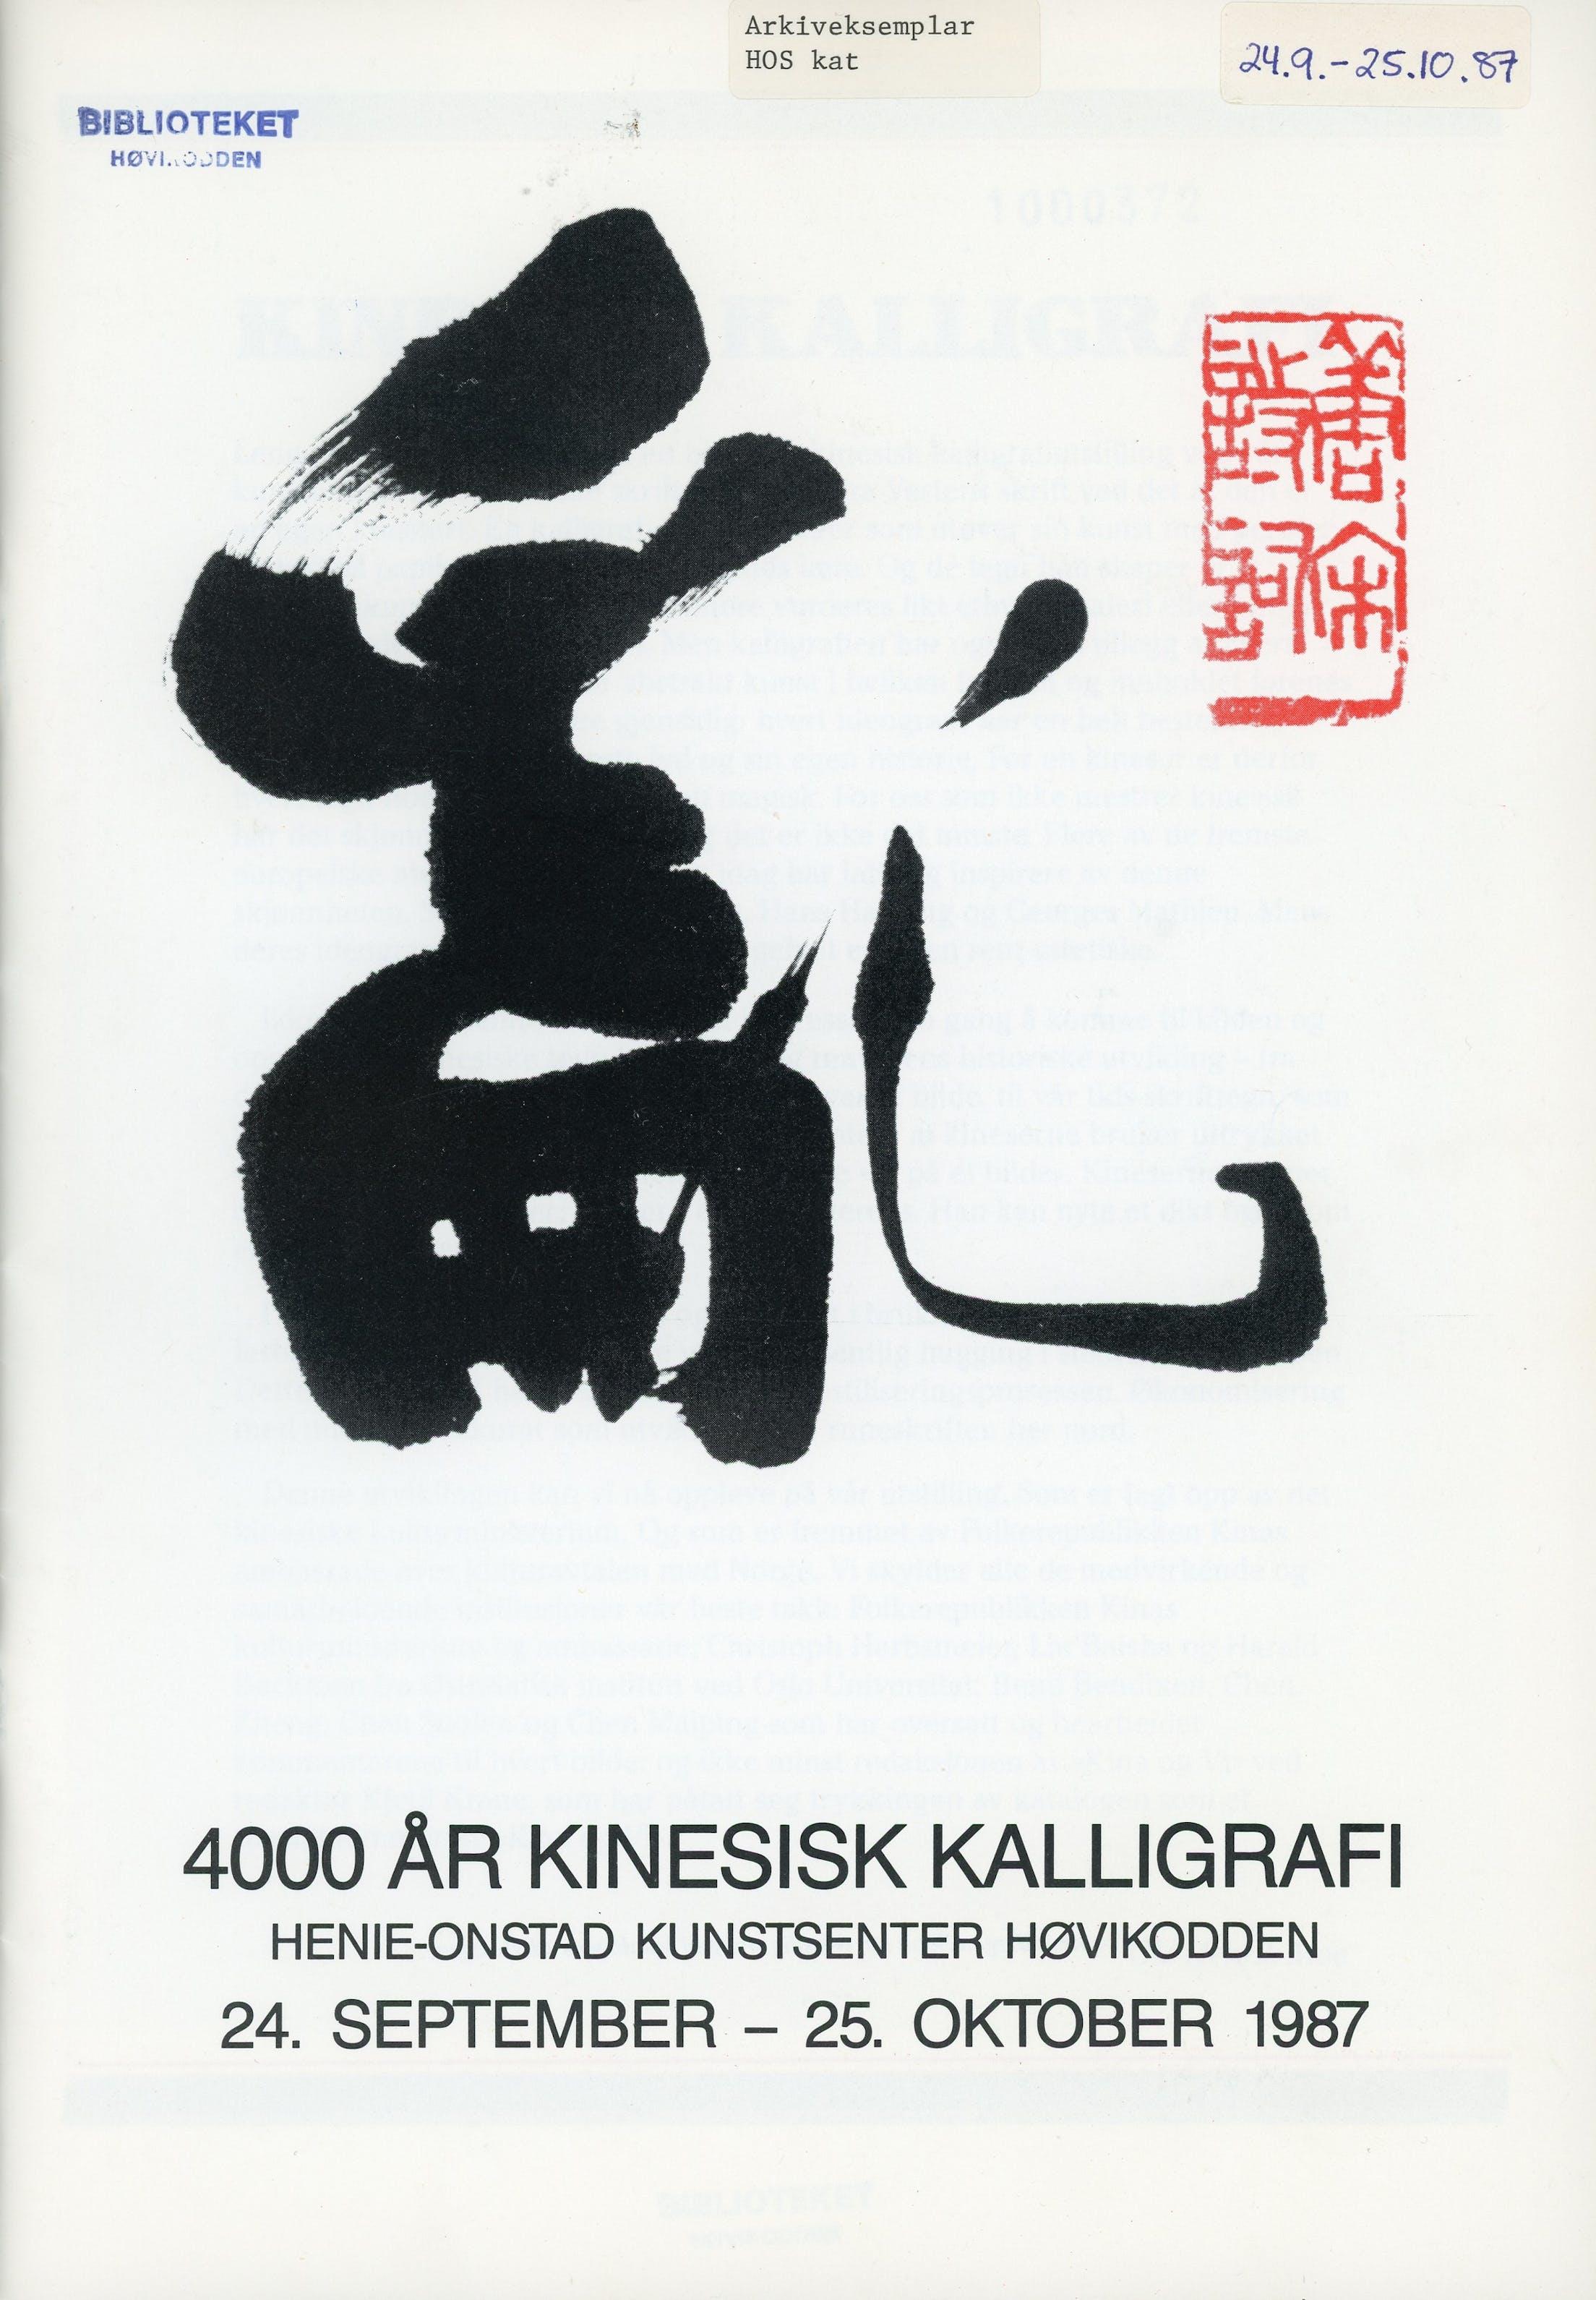 Kinesiskkalligrafi001